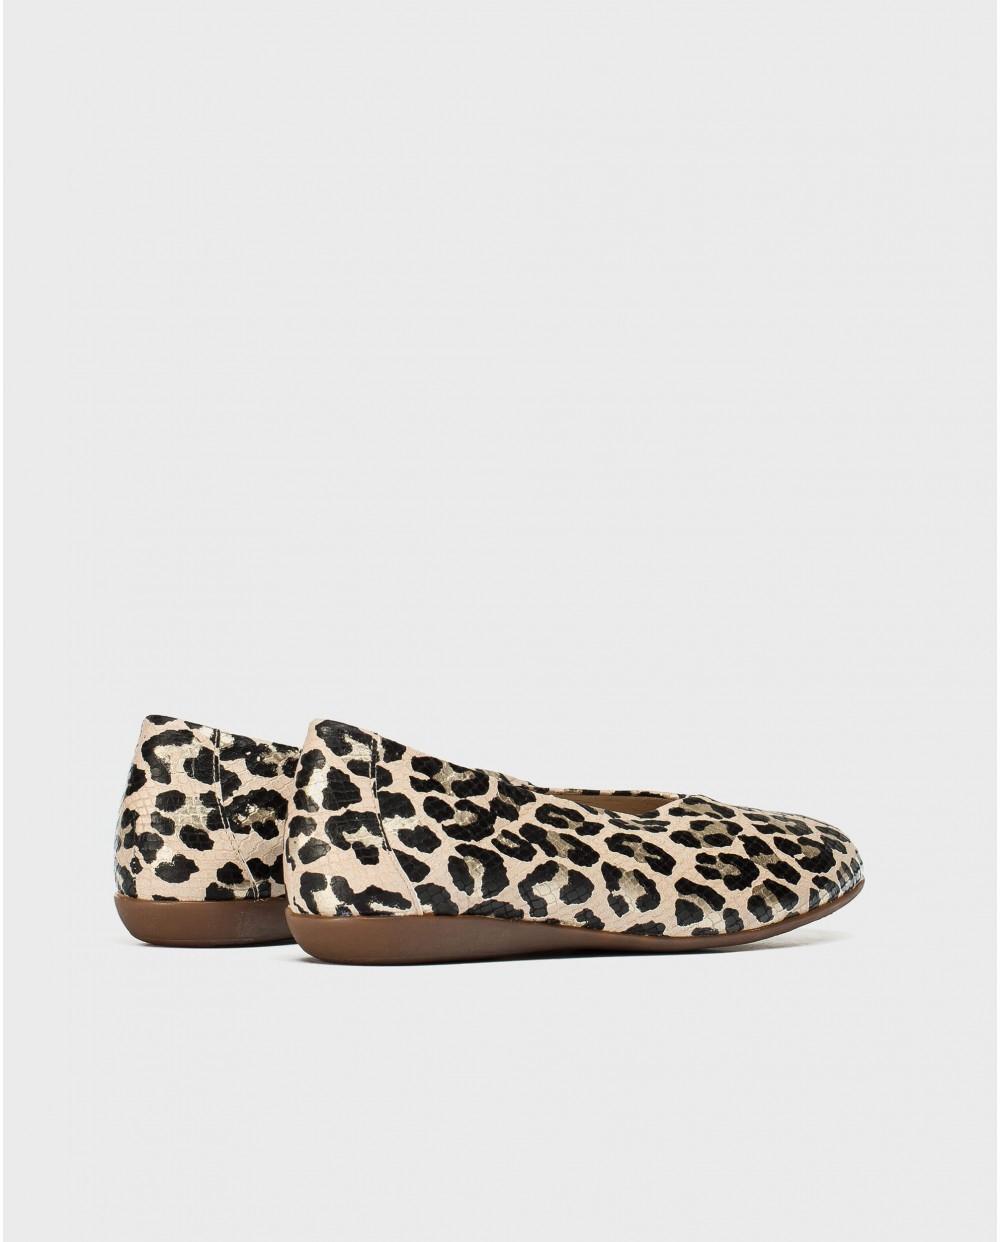 Wonders-Flat Shoes-High cut ballet pump